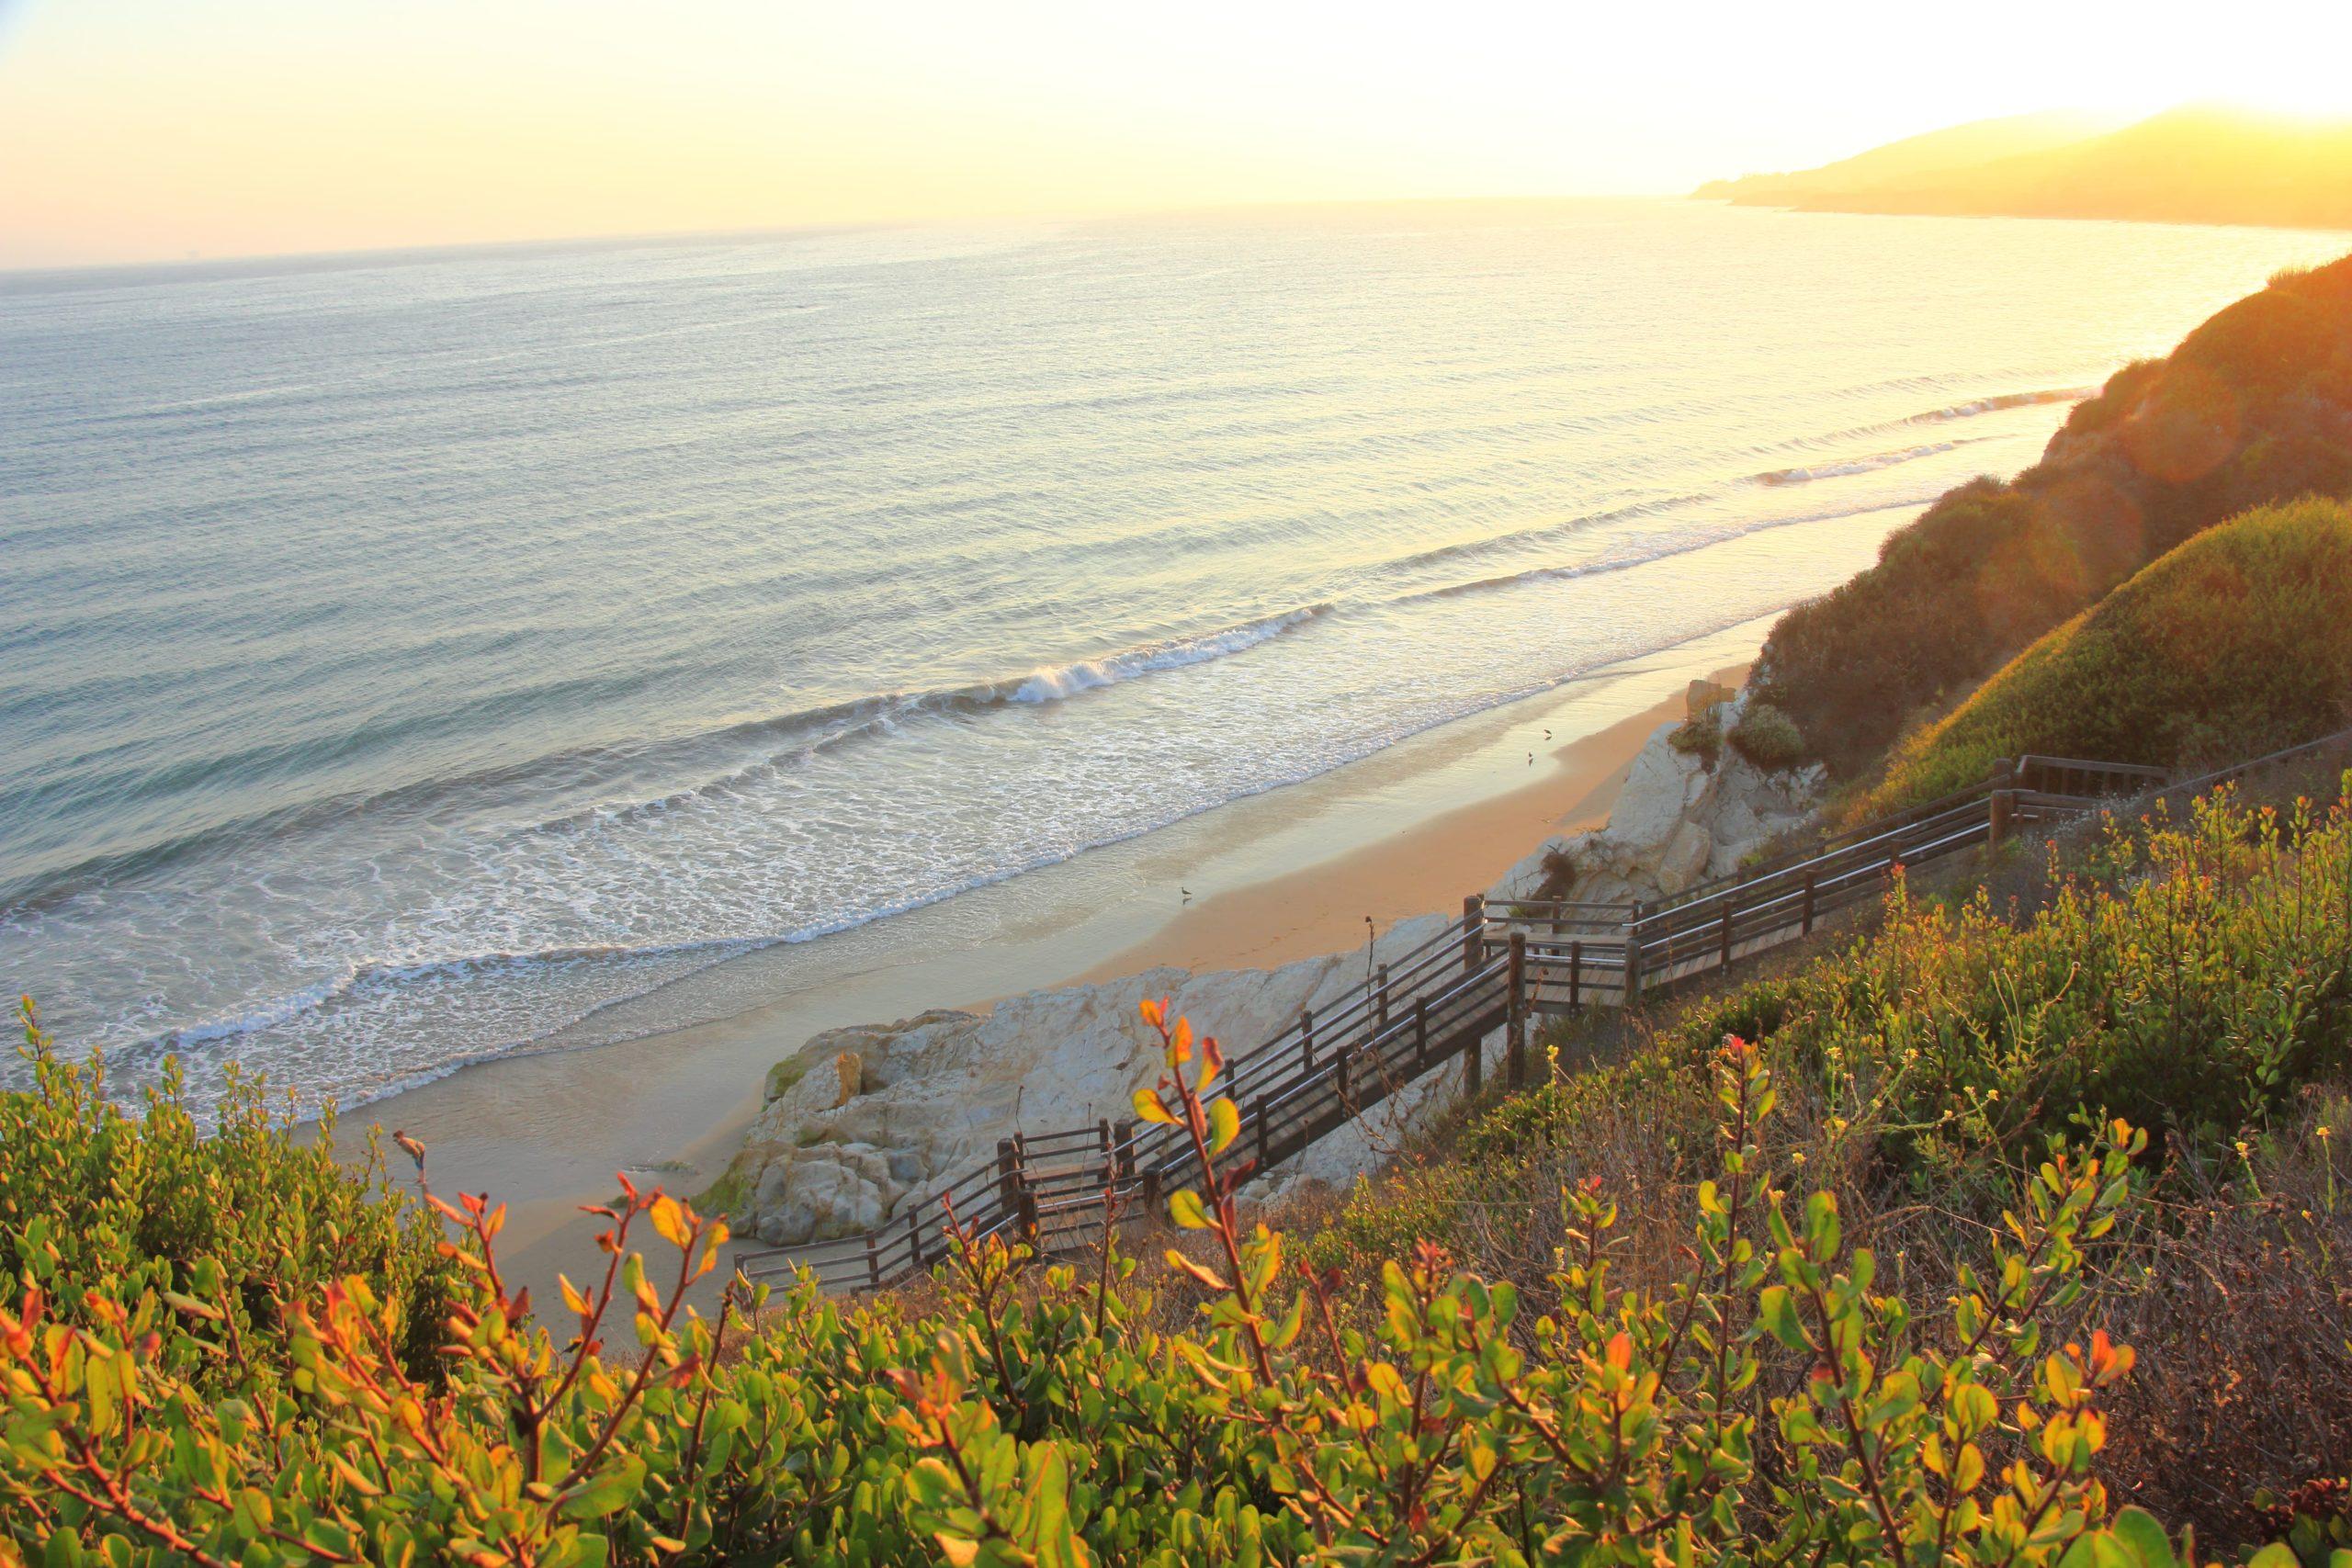 Surfing Santa Barbara - El Capitan State Beach